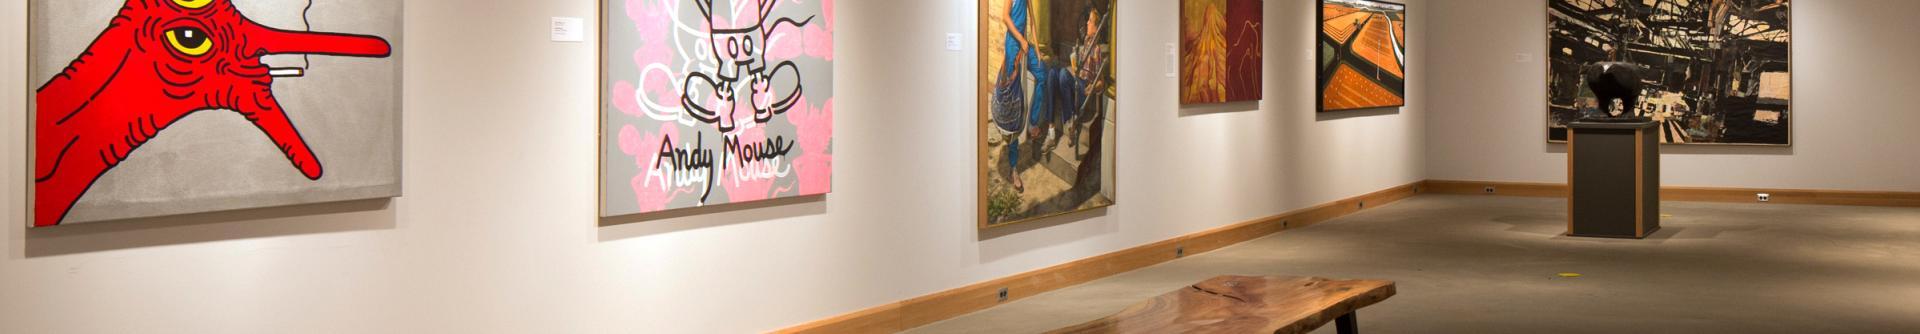 Allentown Art Museum 10 Discover Lehigh Valley